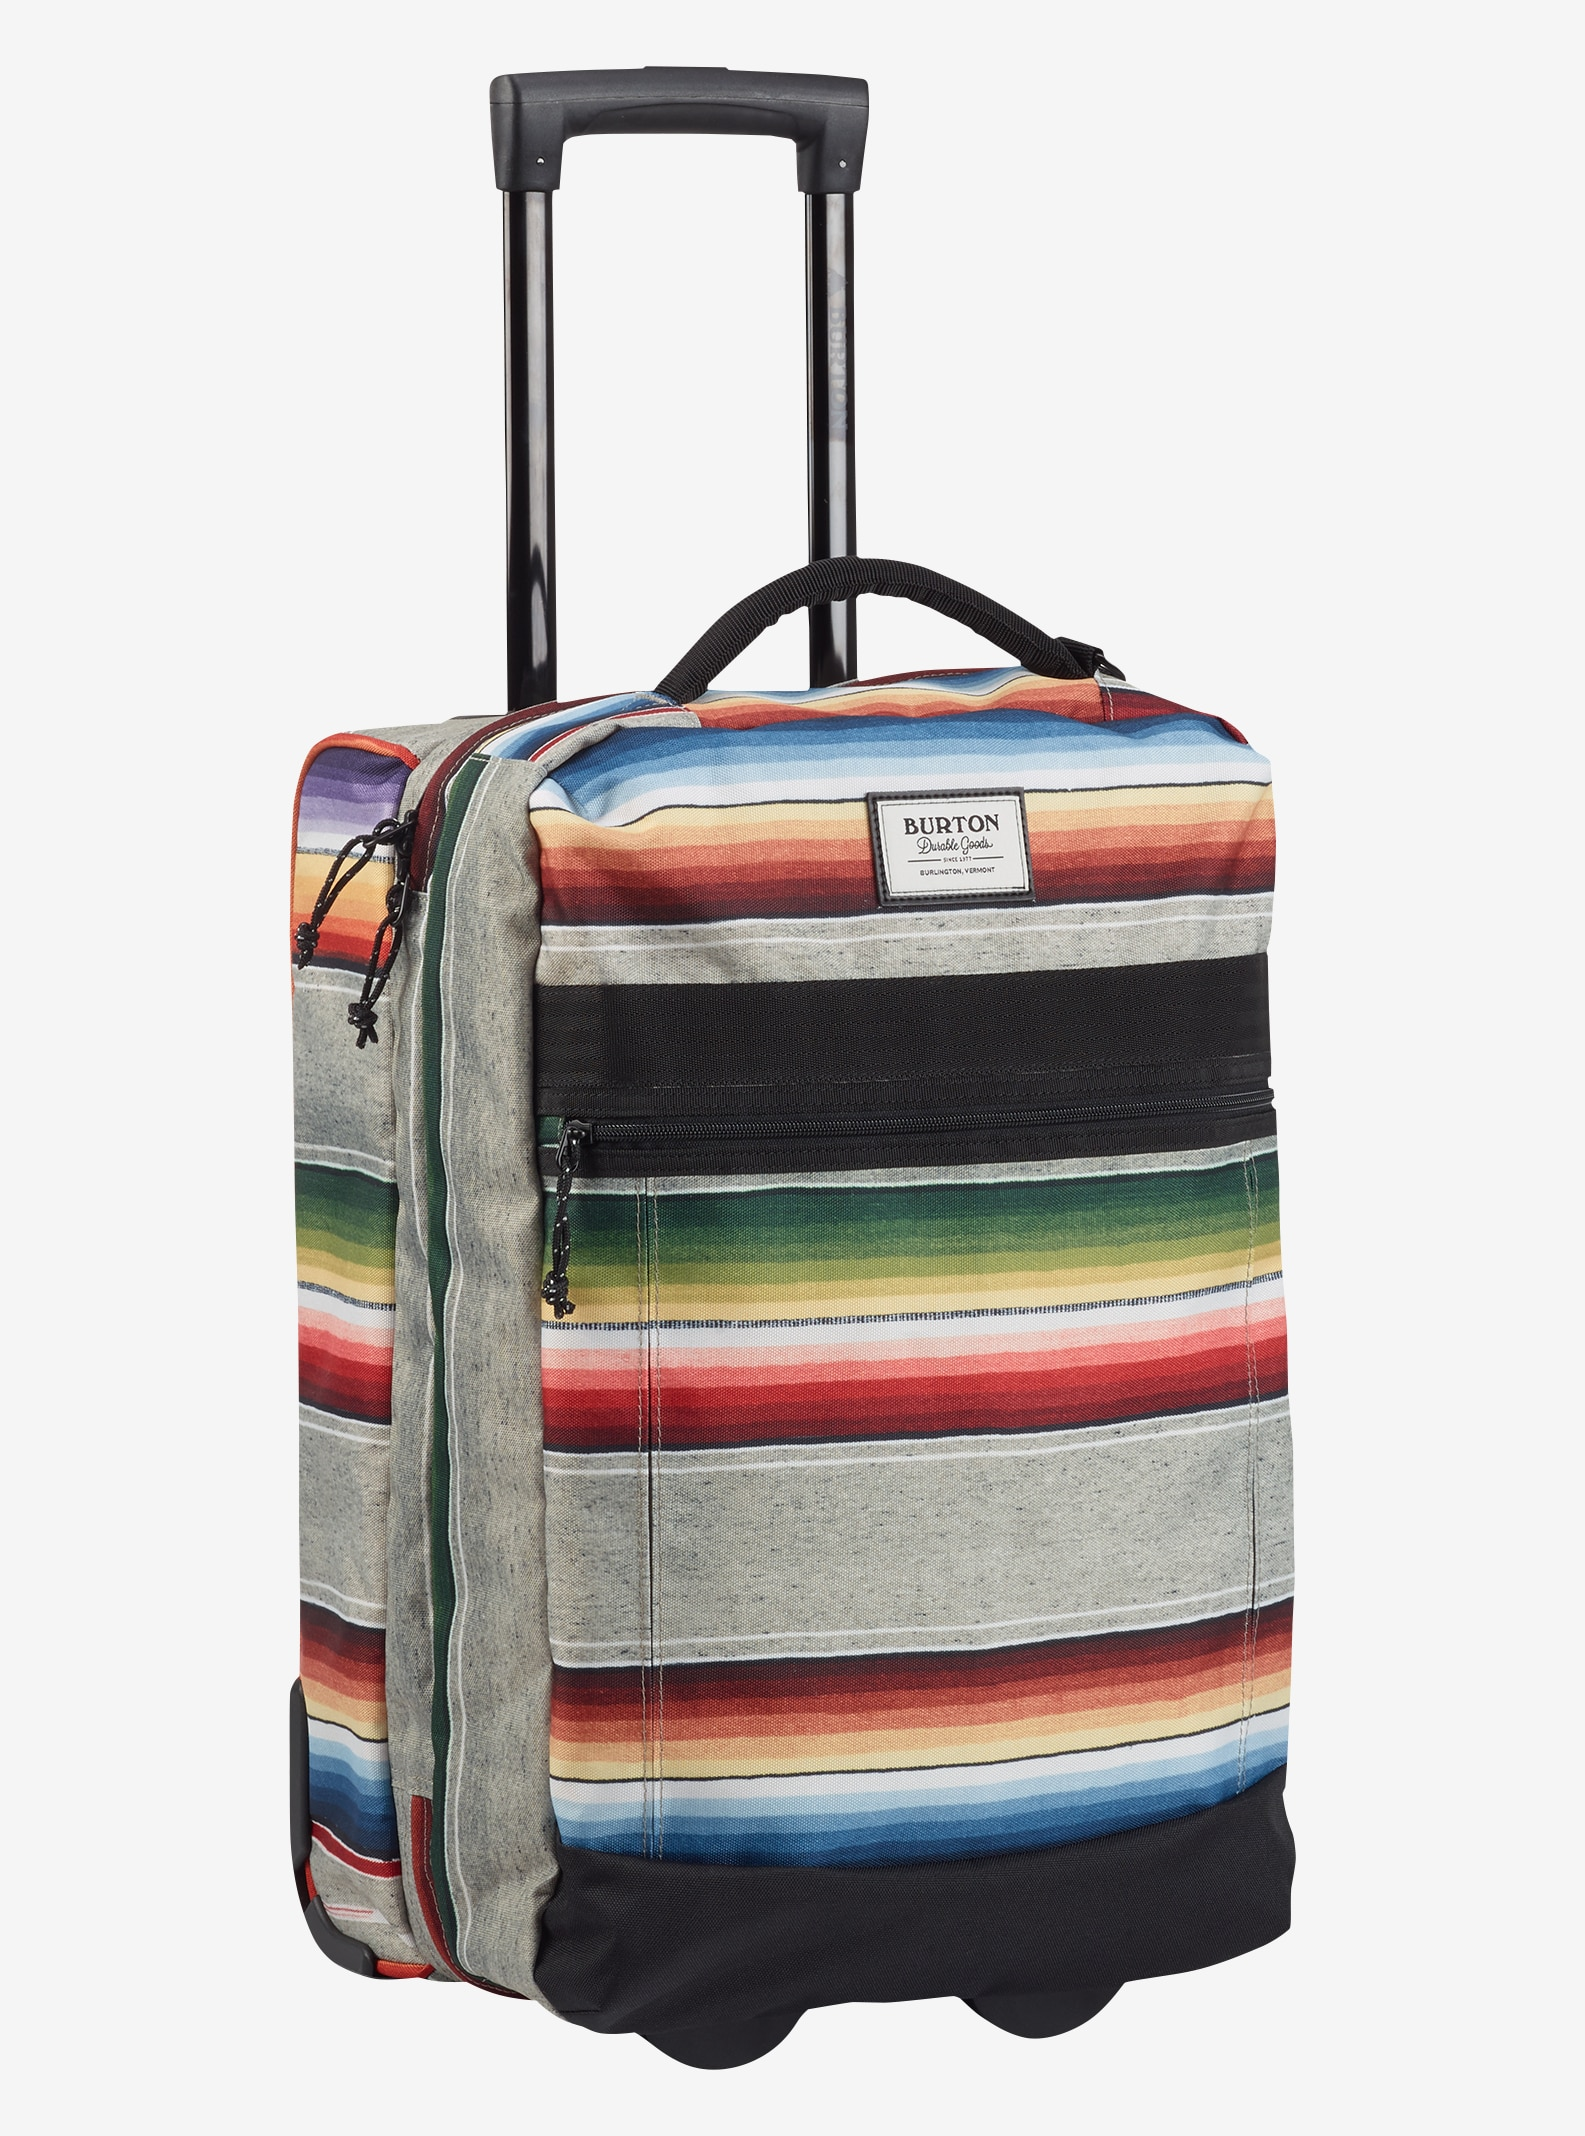 Burton Overnighter Roller Travel Bag shown in Bright Sinola Stripe Print